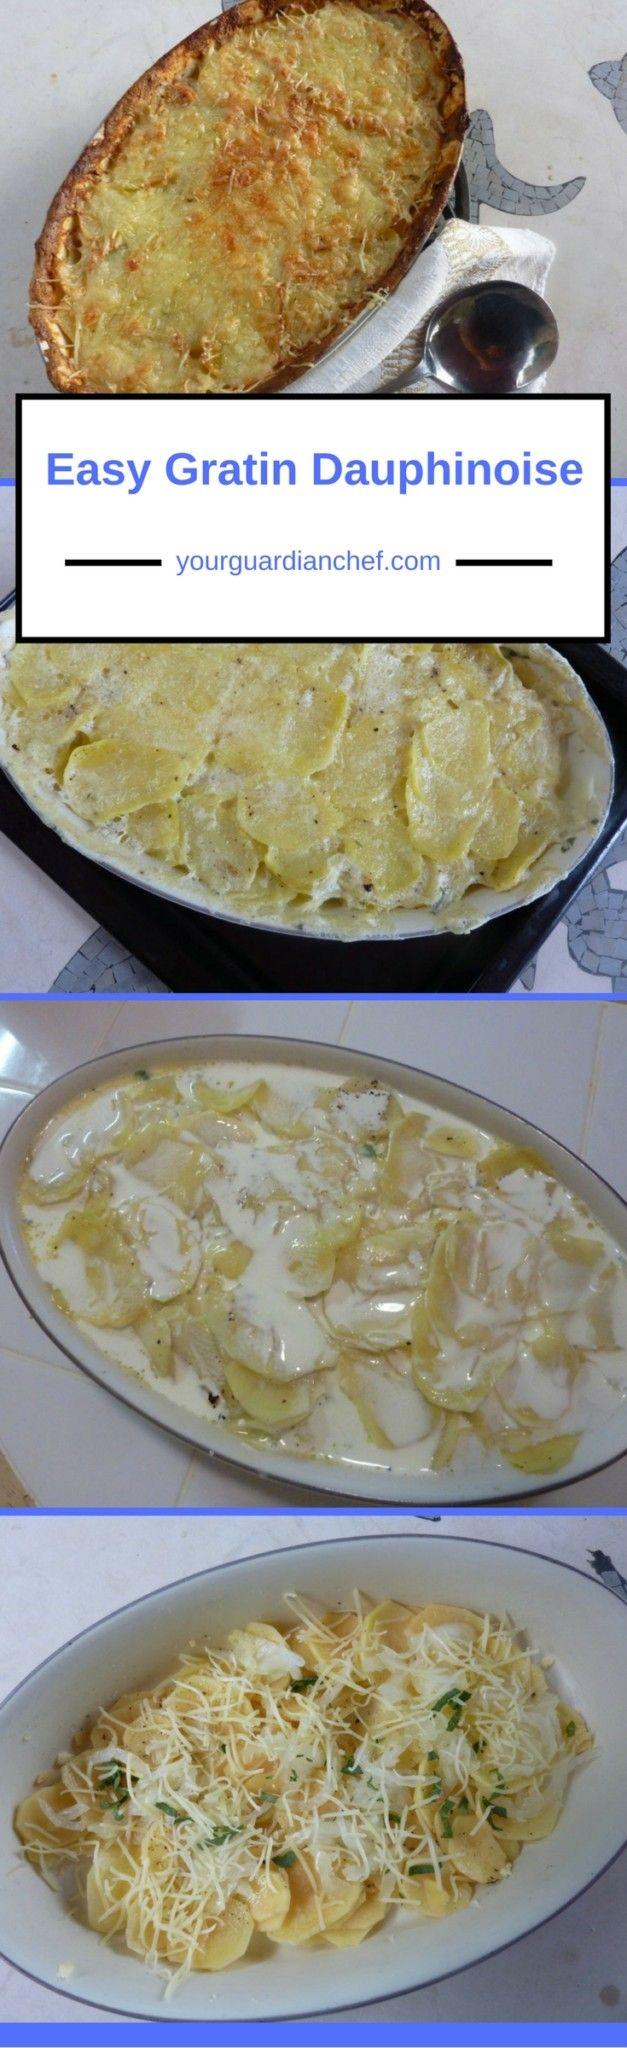 Easy Gratin Dauphinoise Recipe